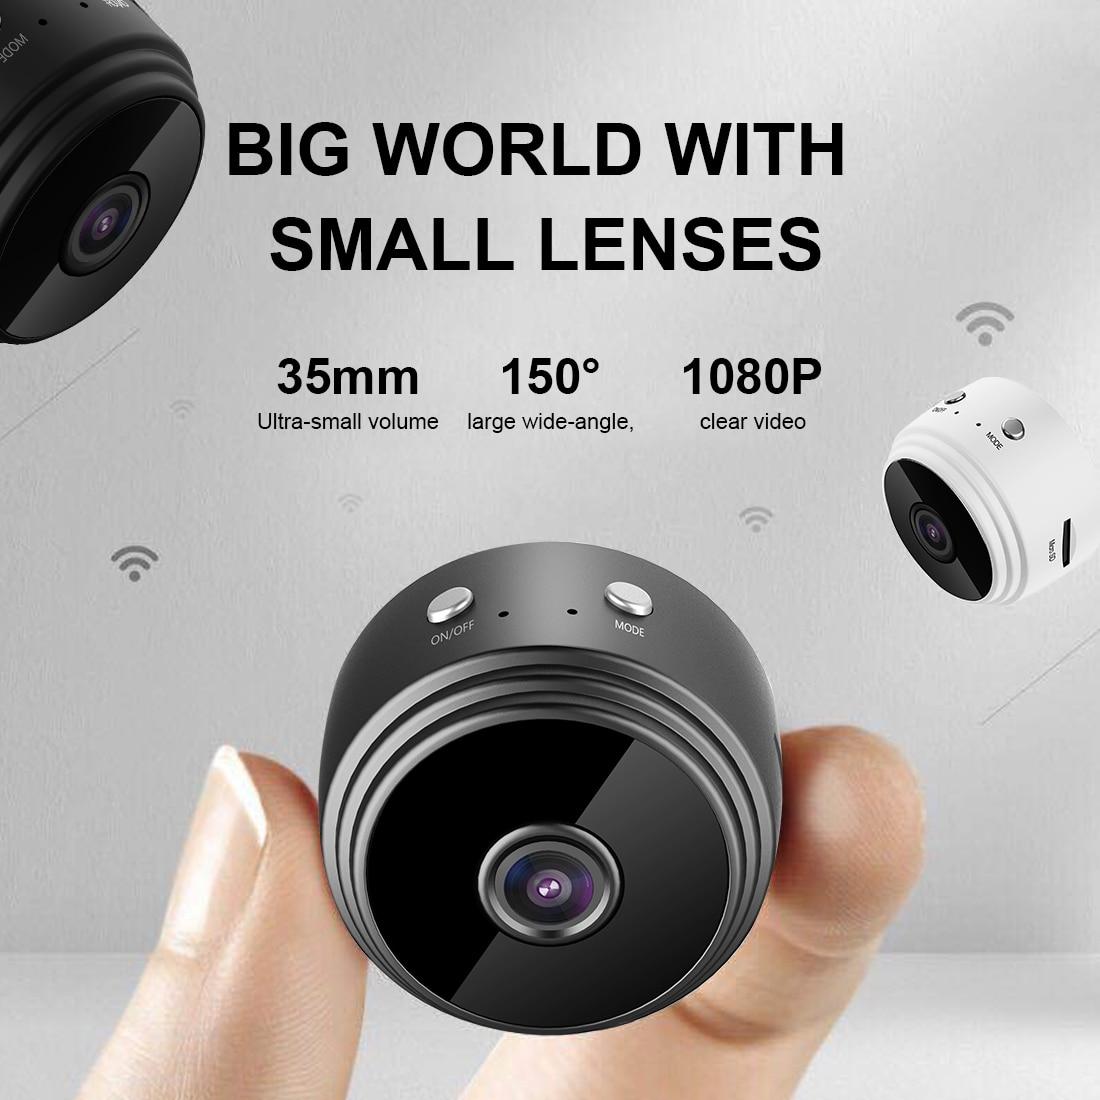 1080P Mini Camera A9 Wifi Camera Wireless Home Security Surveillance Camera Motion Detection IR Night Vision App Remote Monitor